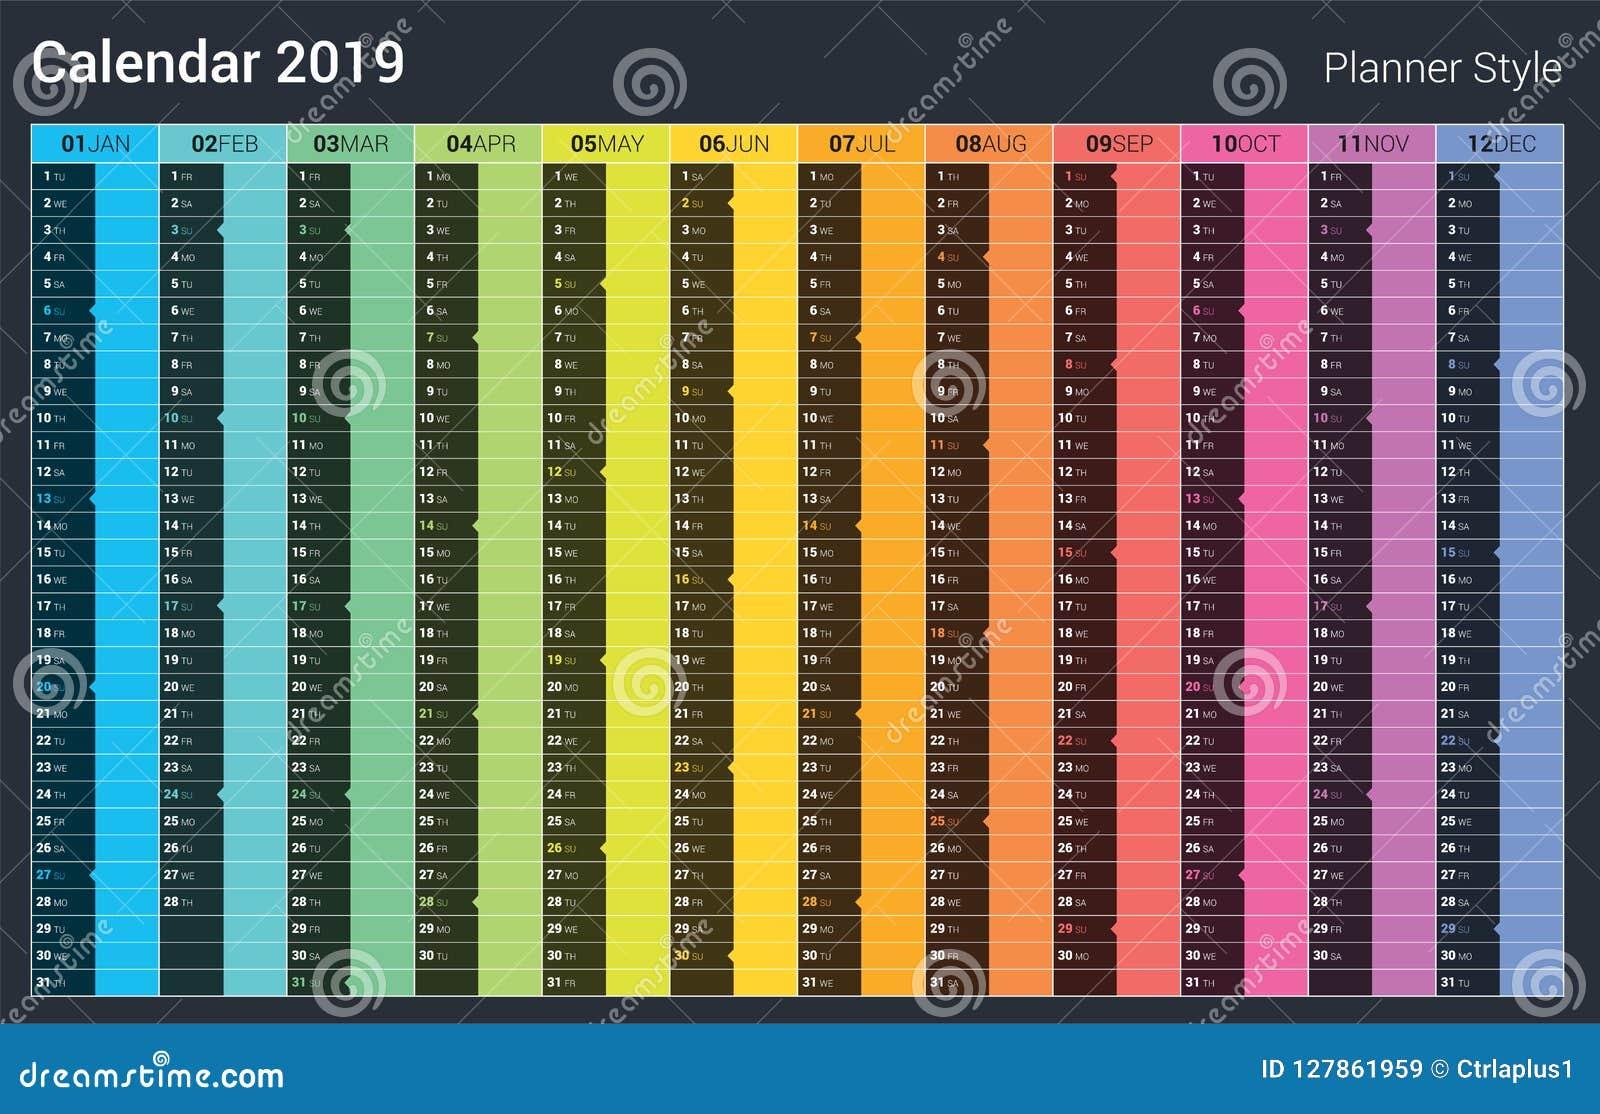 Calendario Fin De Semana 2019.Diseno Del Calendario Del Planificador 2019 Estilo A Todo